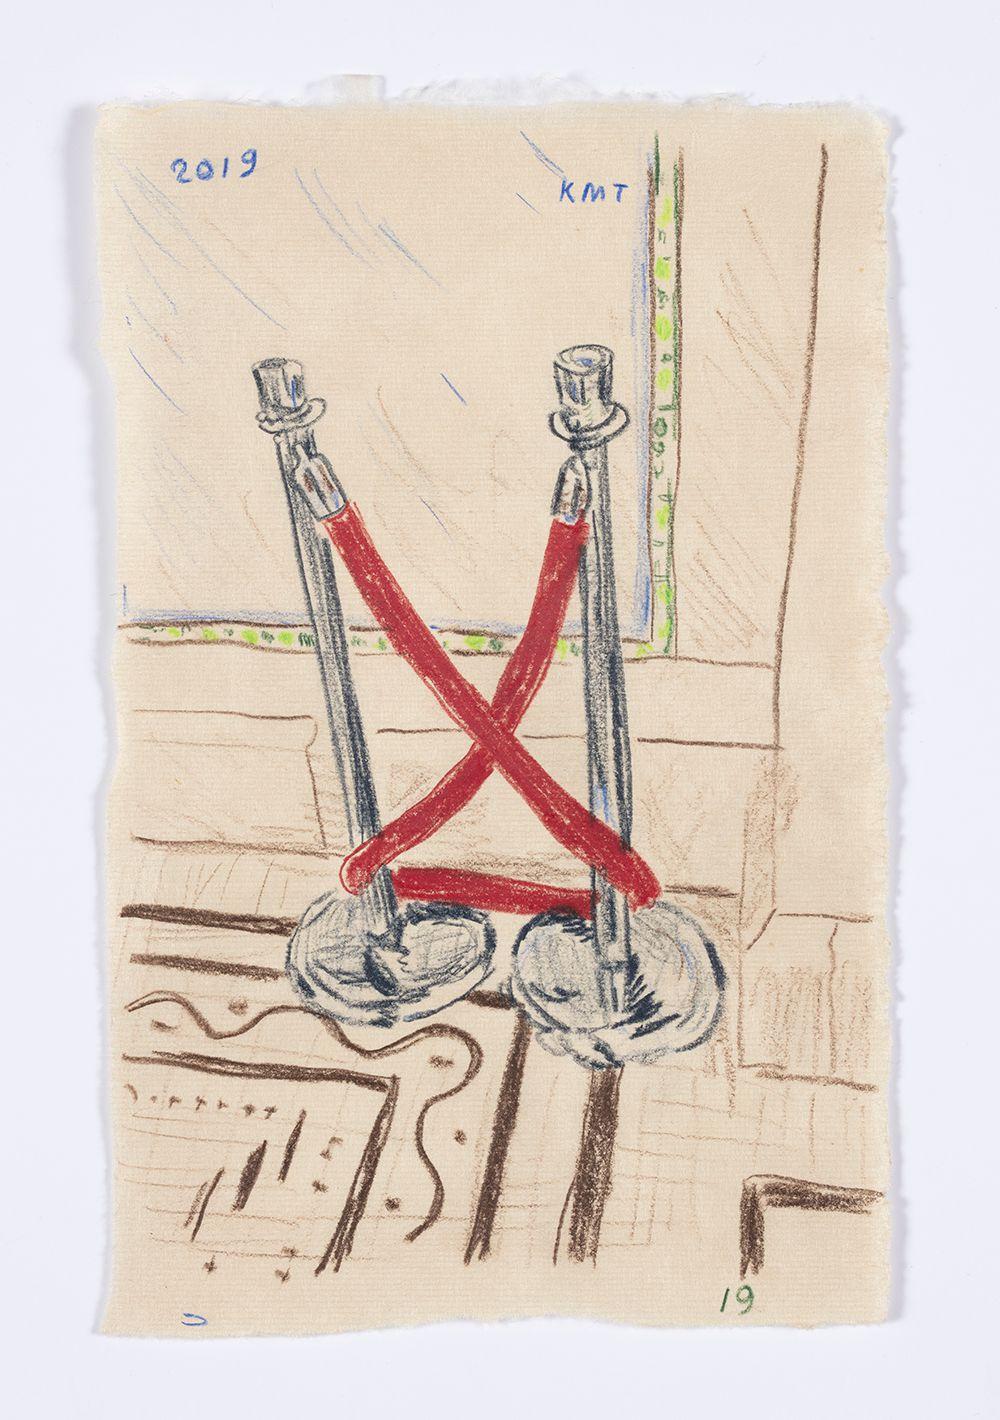 Velvet Rope at Chicago Cultural Center